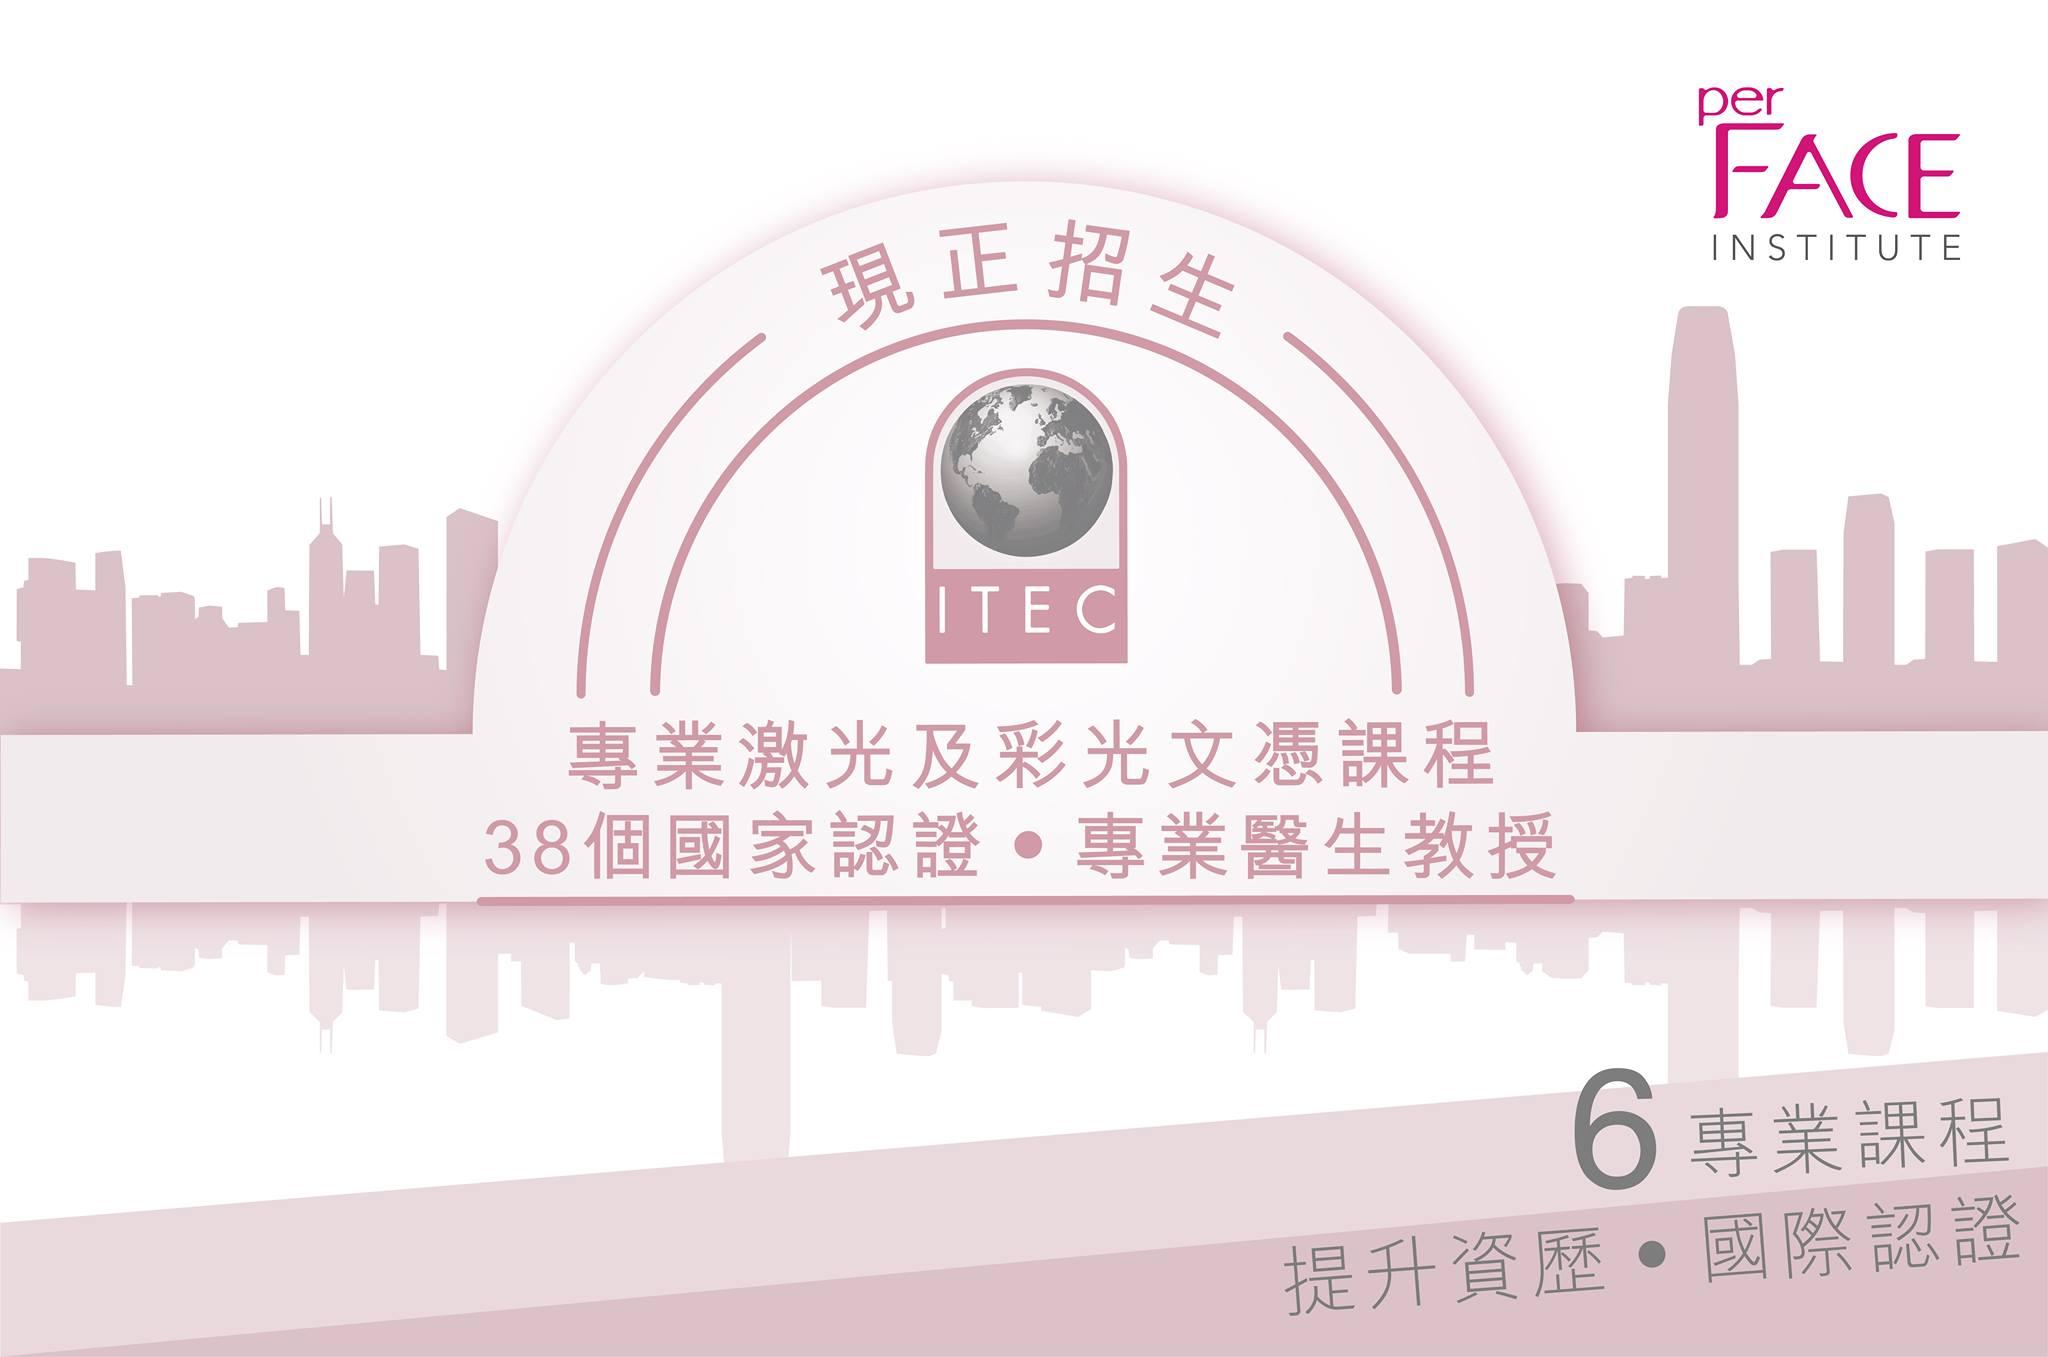 PER FACE Institute 003 190516